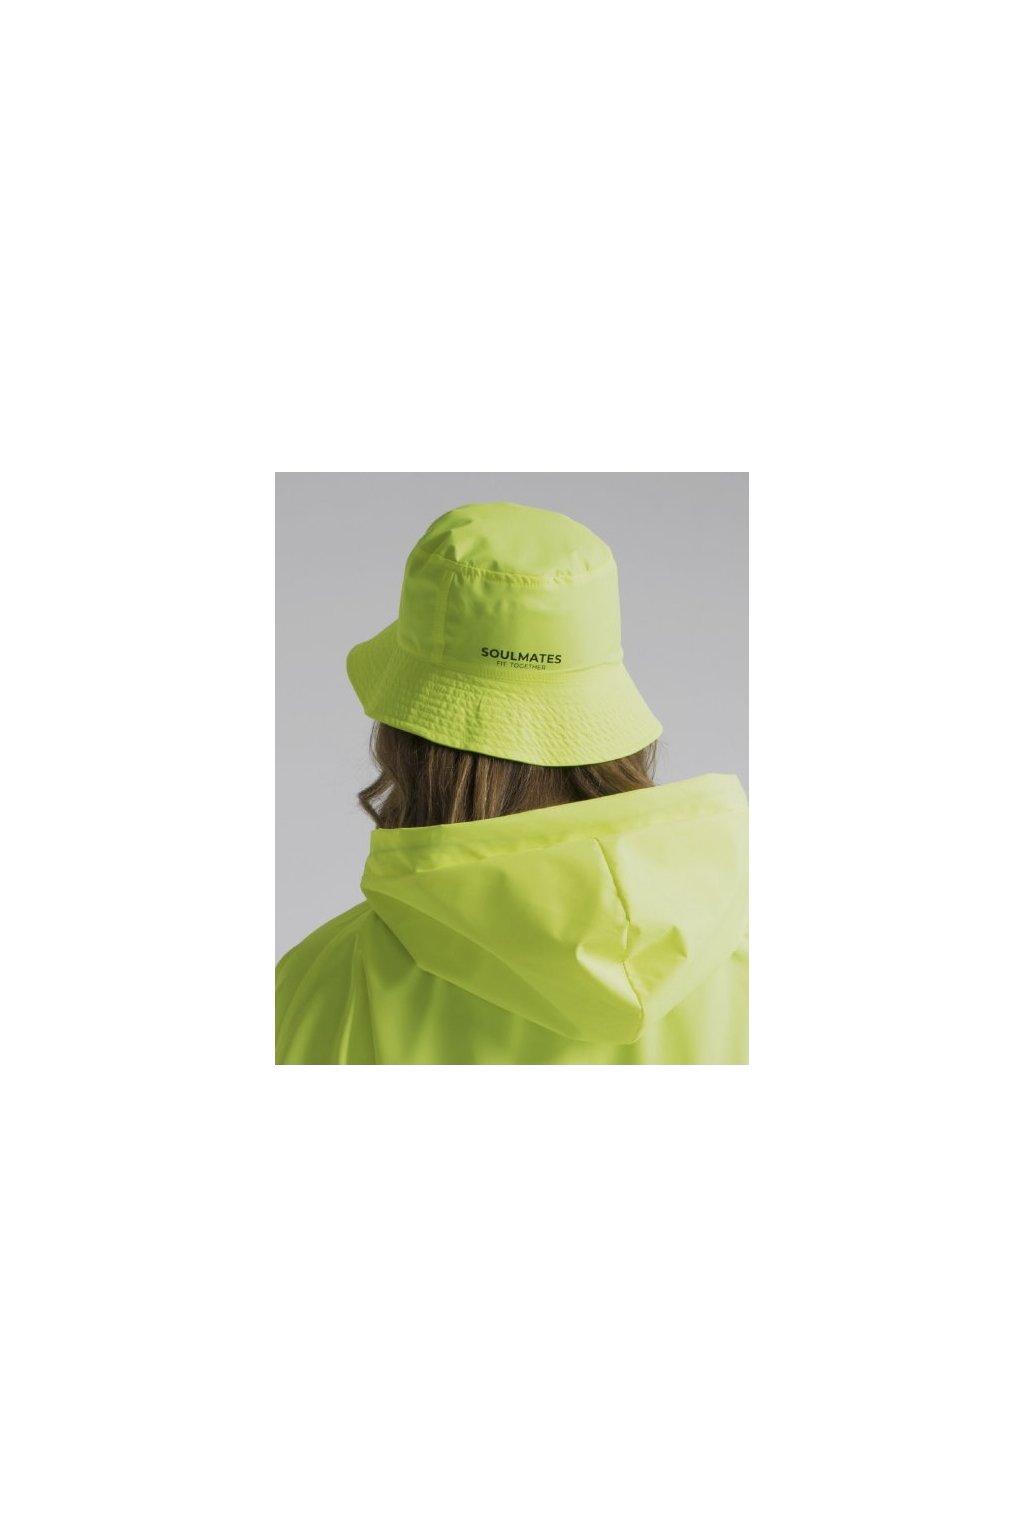 Stylový klobouček SOULMATES • neon yellow / neon žlutá